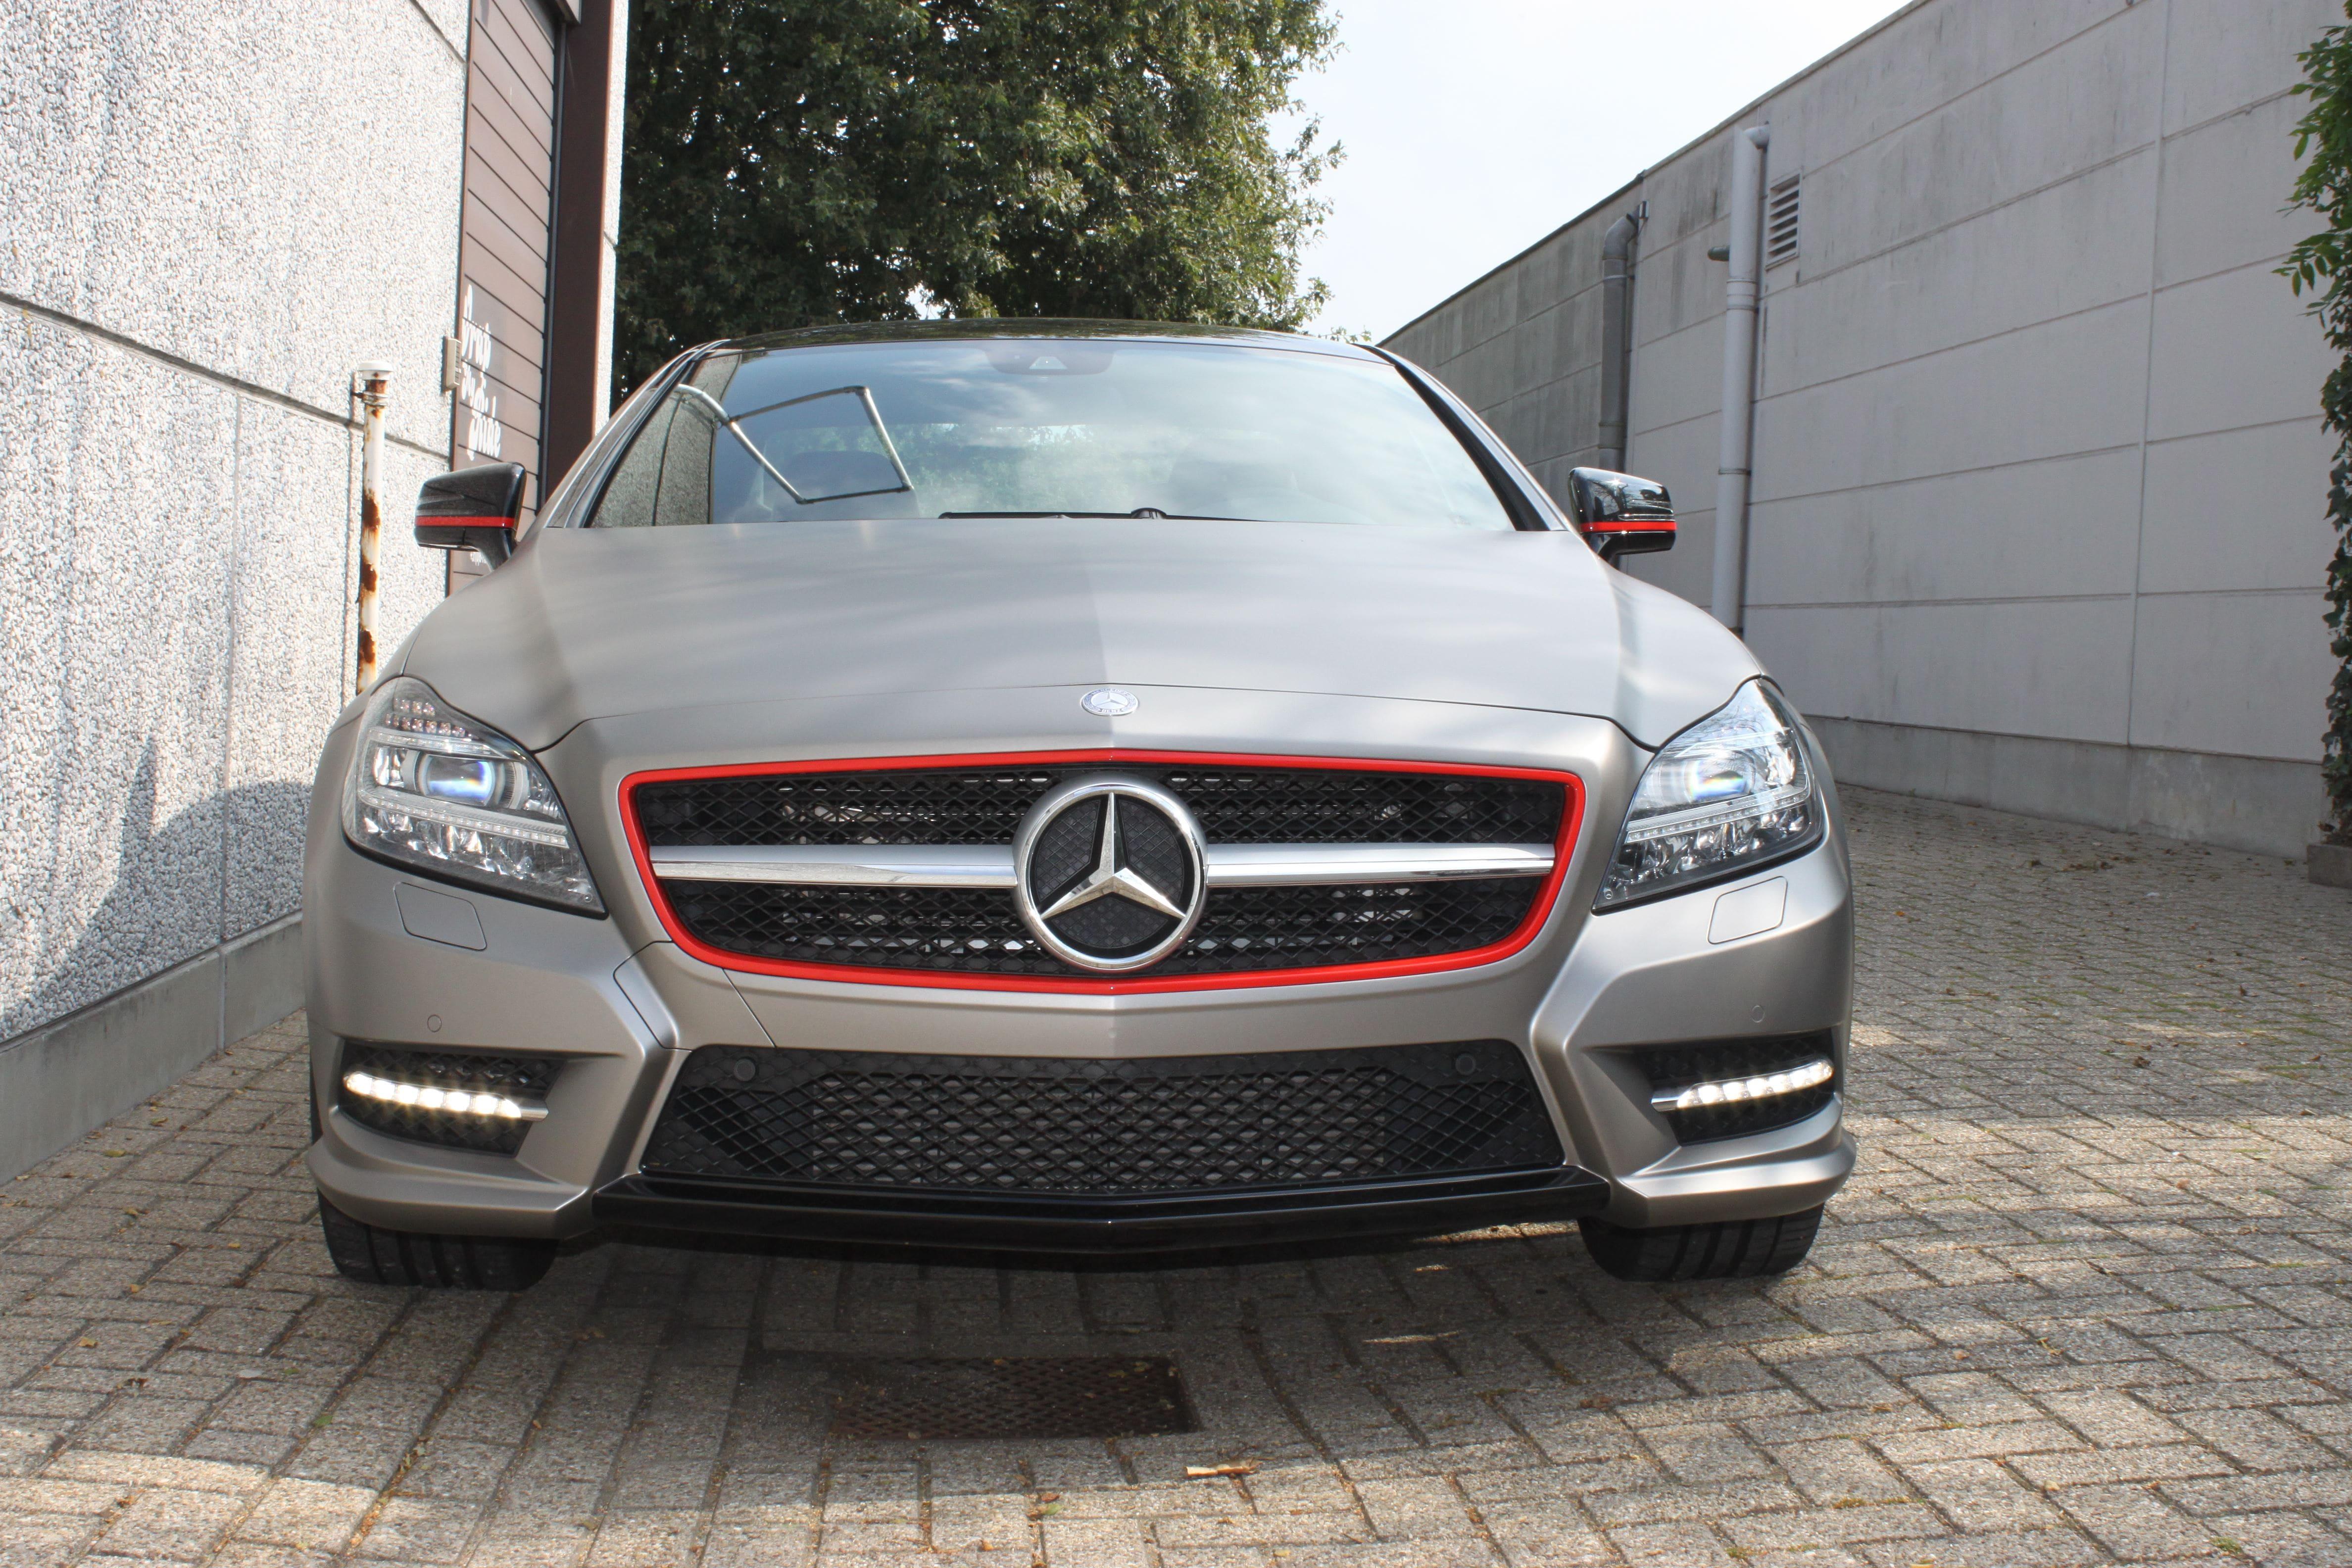 Mercedes CLS met Mat Grey Aluminium Wrap, Carwrapping door Wrapmyride.nu Foto-nr:6152, ©2020